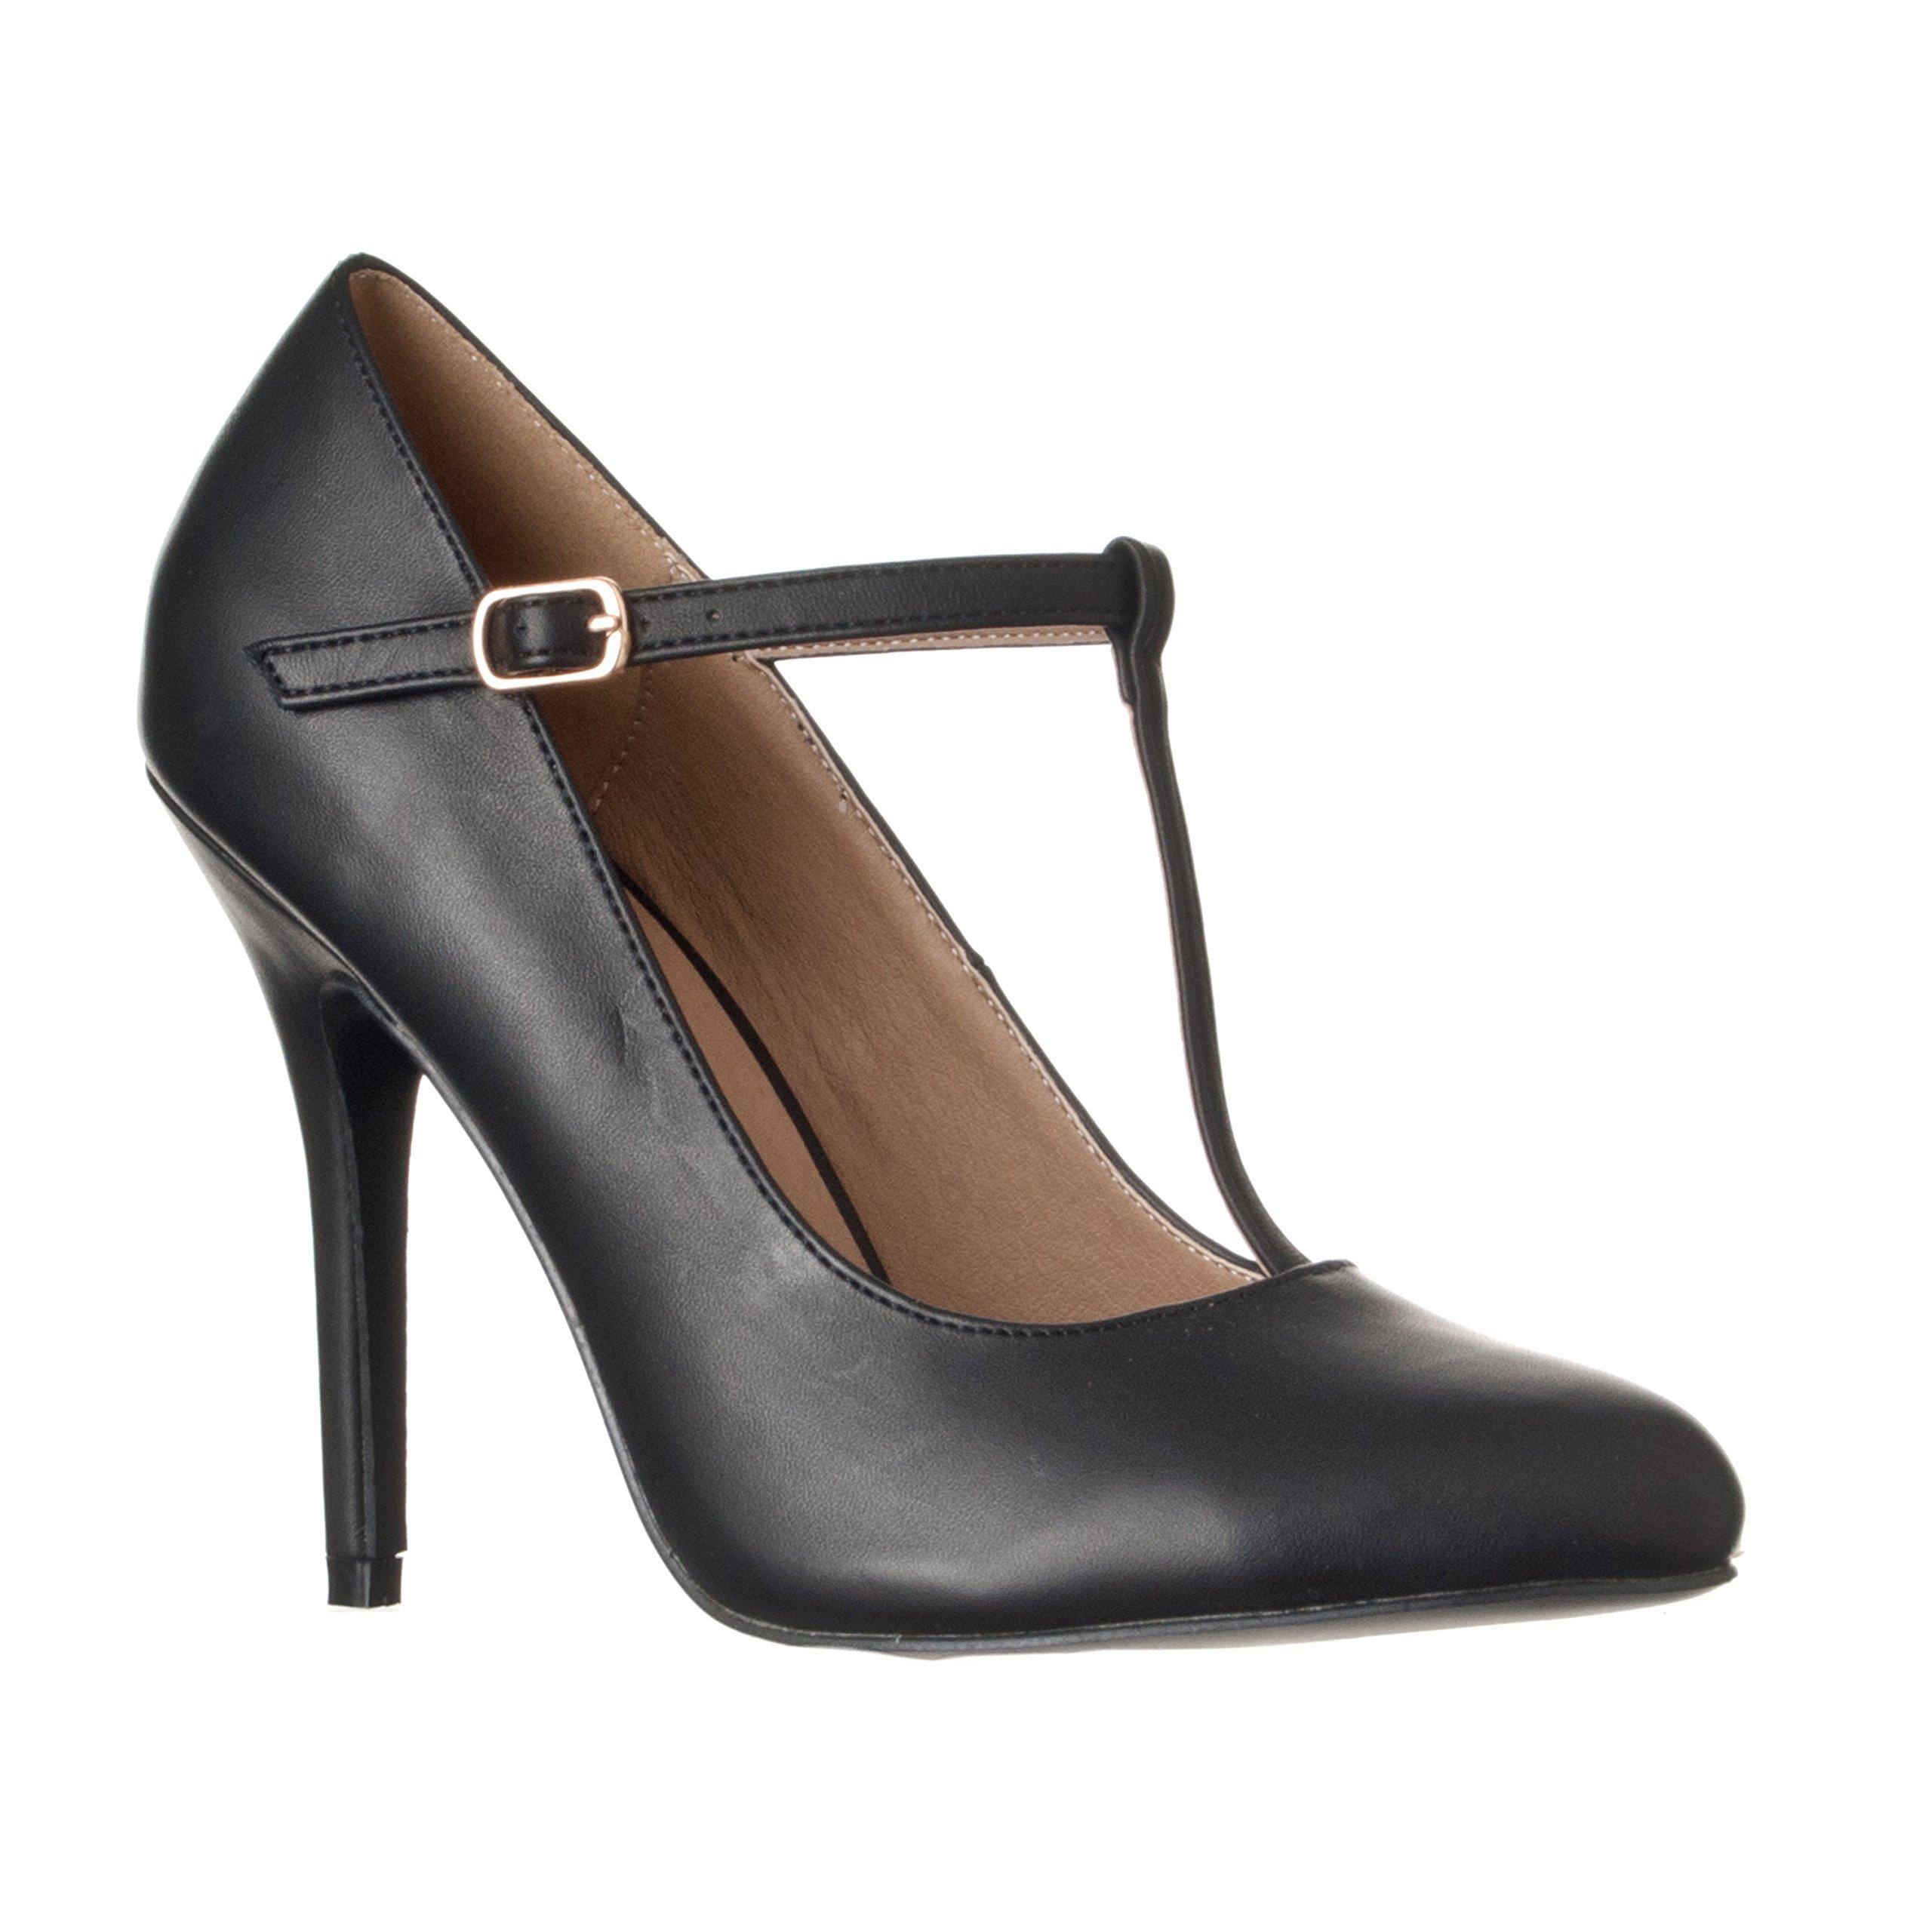 Riverberry Women's Sadie Round Toe T-Strap High Heel Pumps, Black PU, 8.5